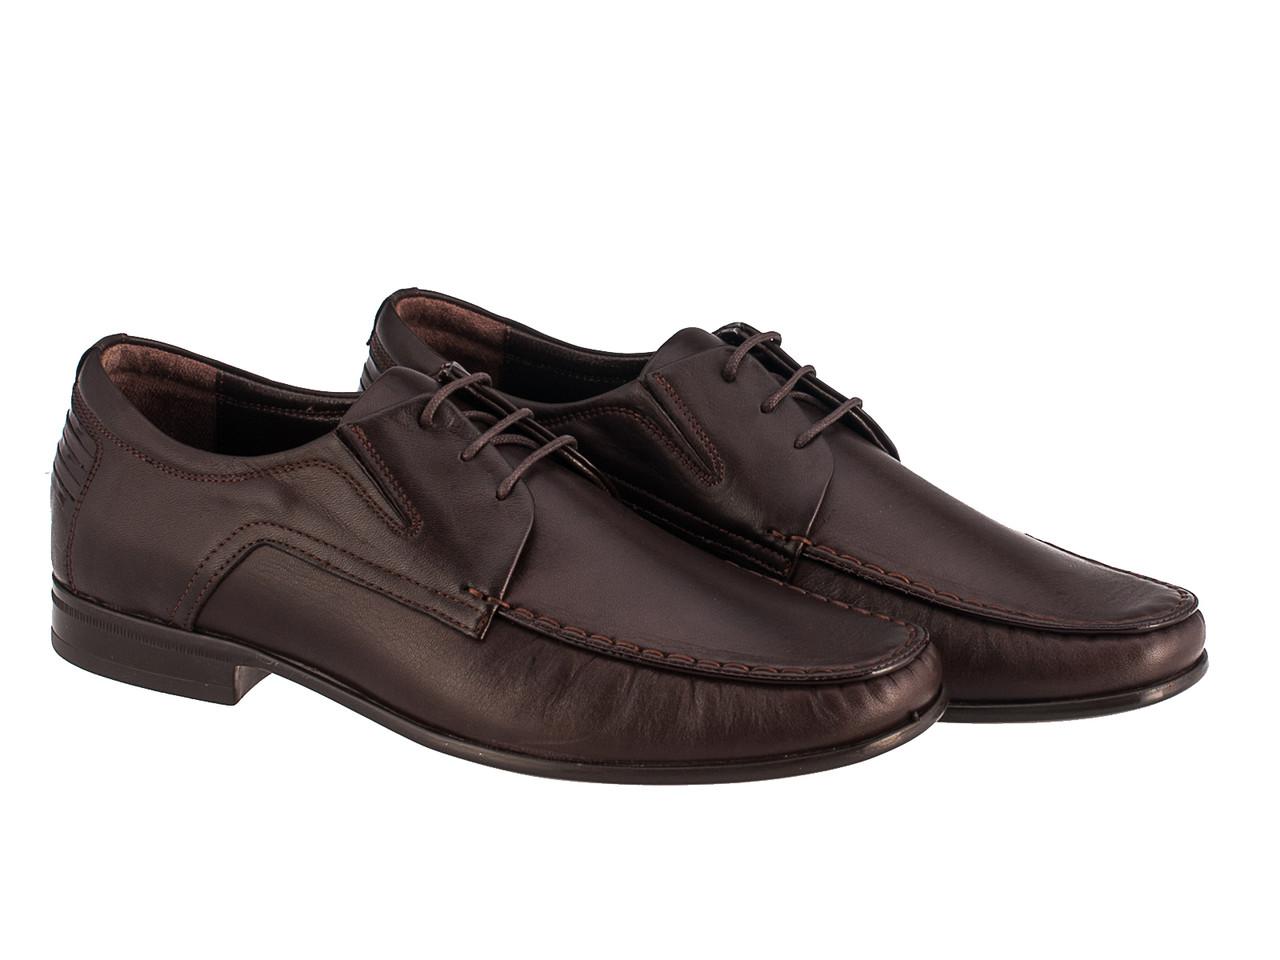 Мокасины Etor 9541-679-1 40 коричневые